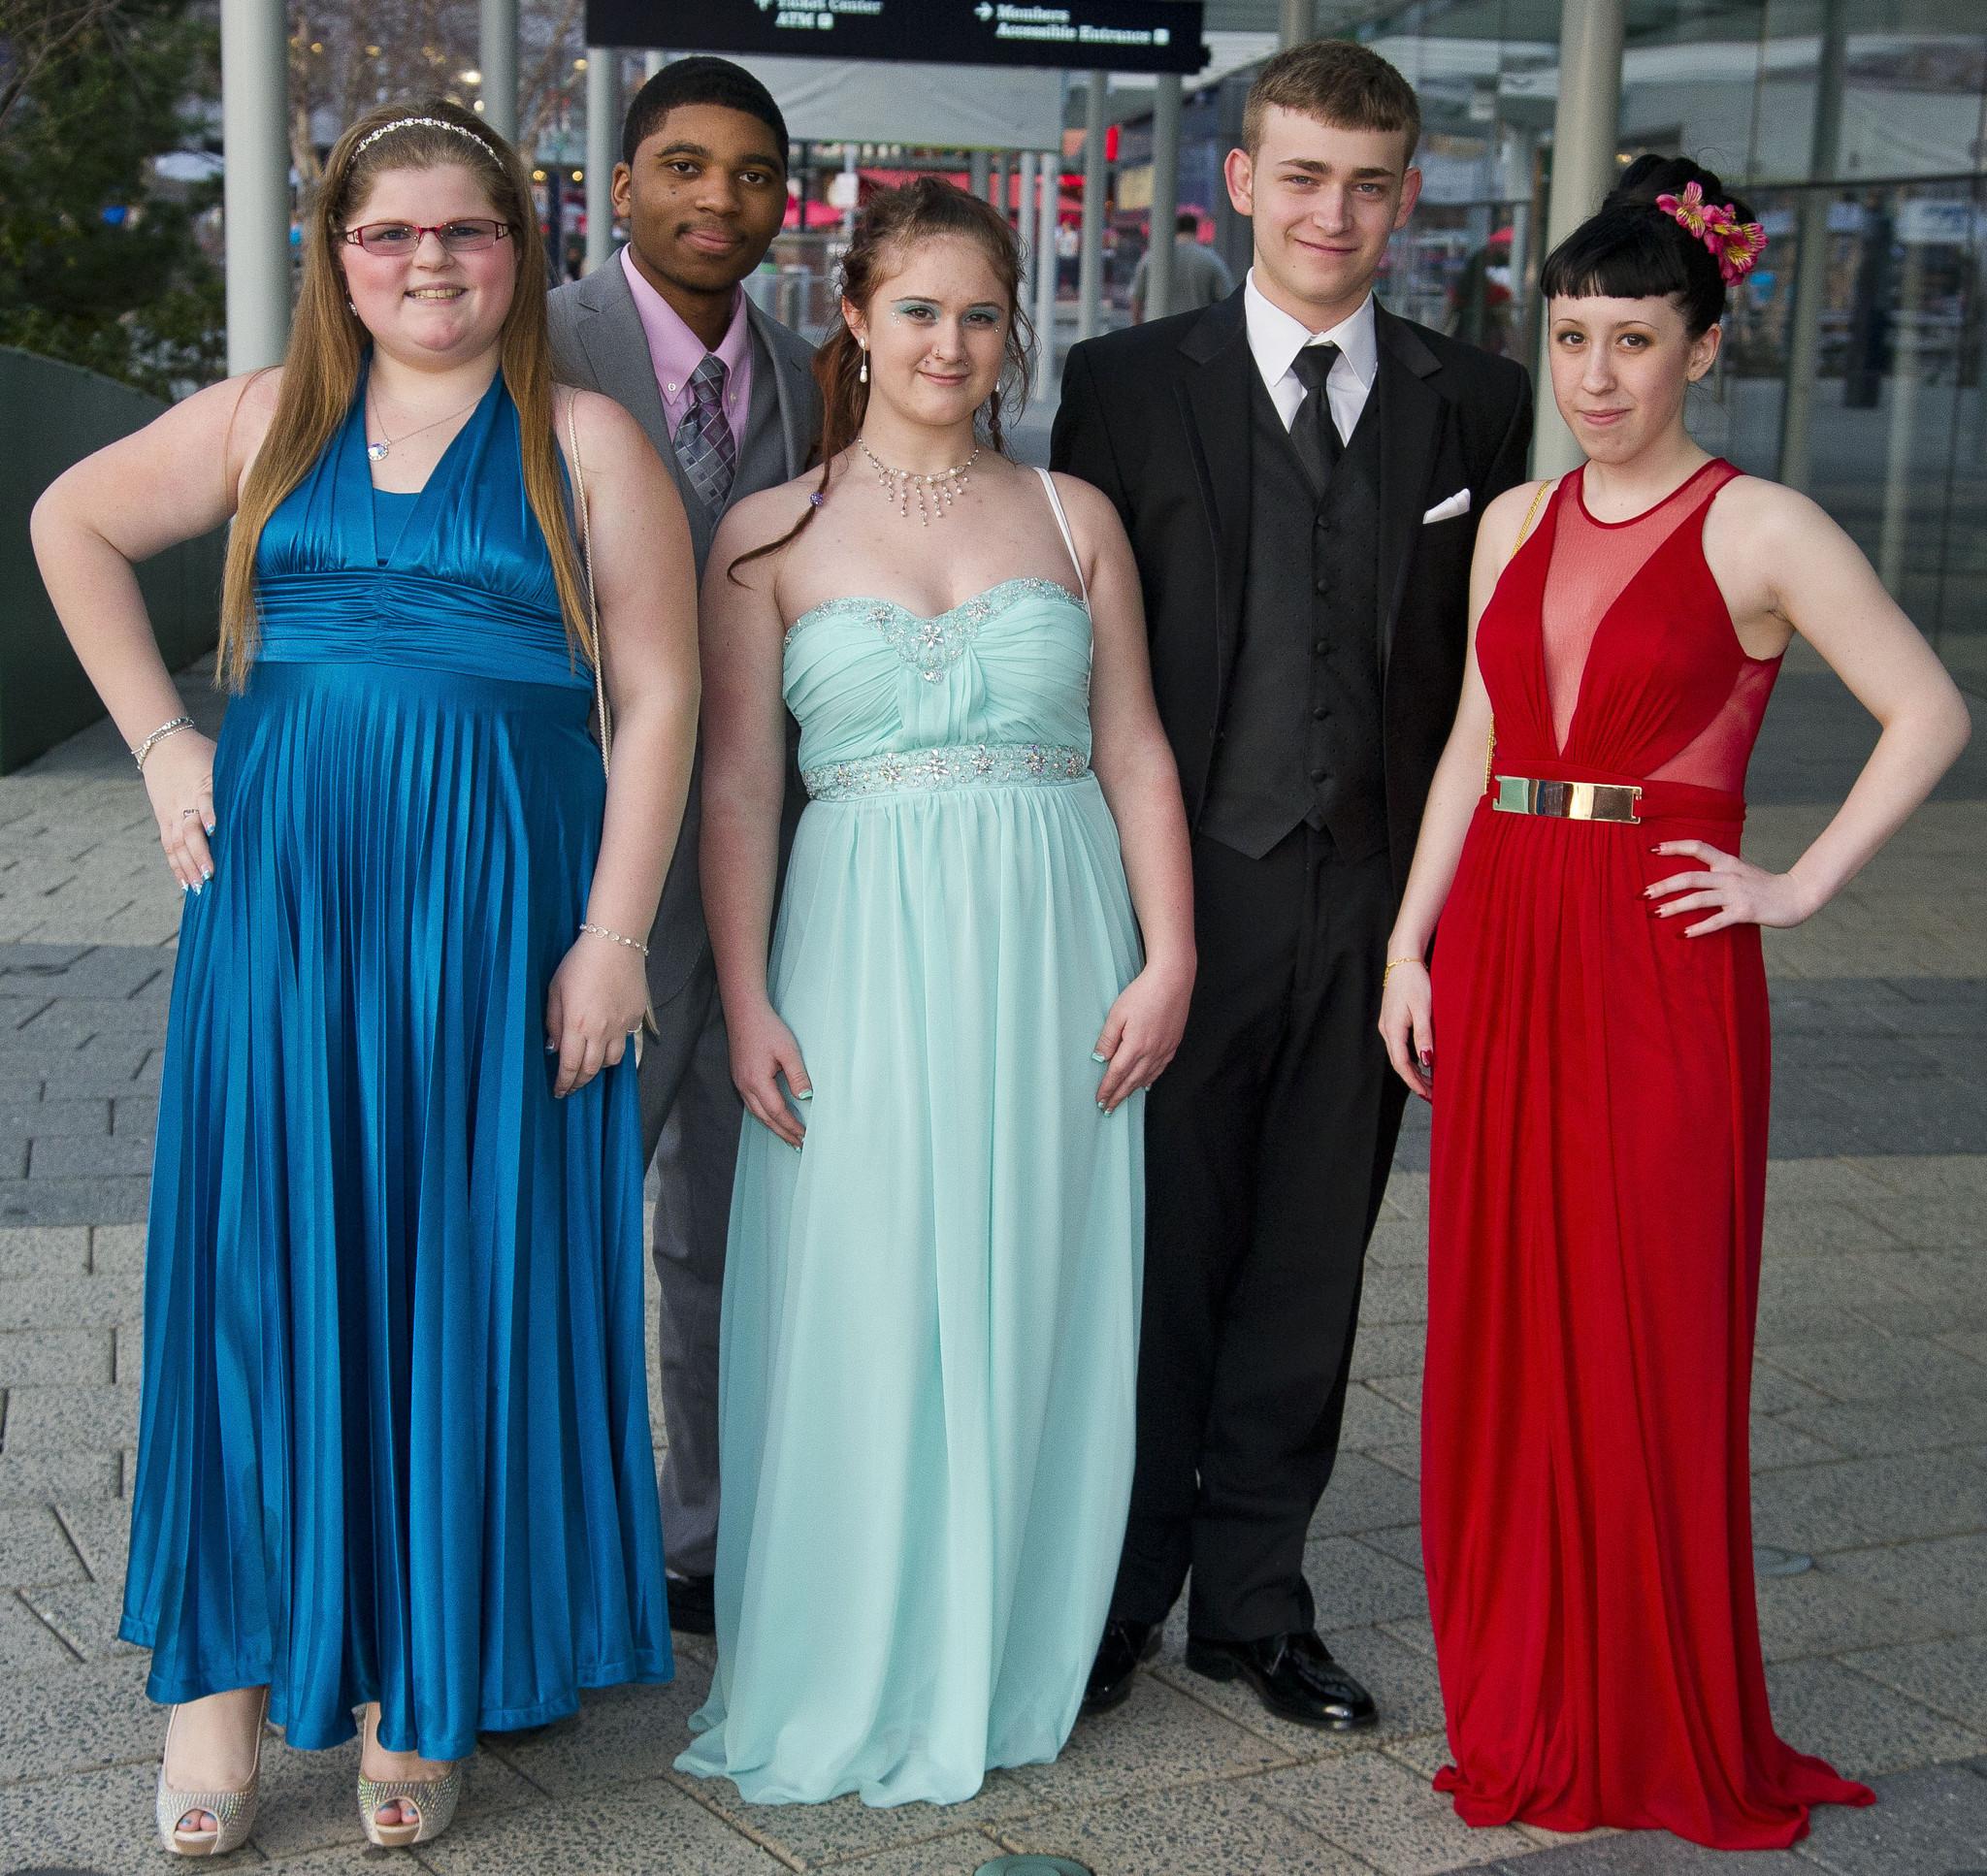 Edgewood High School 2014 Prom - Baltimore Sun